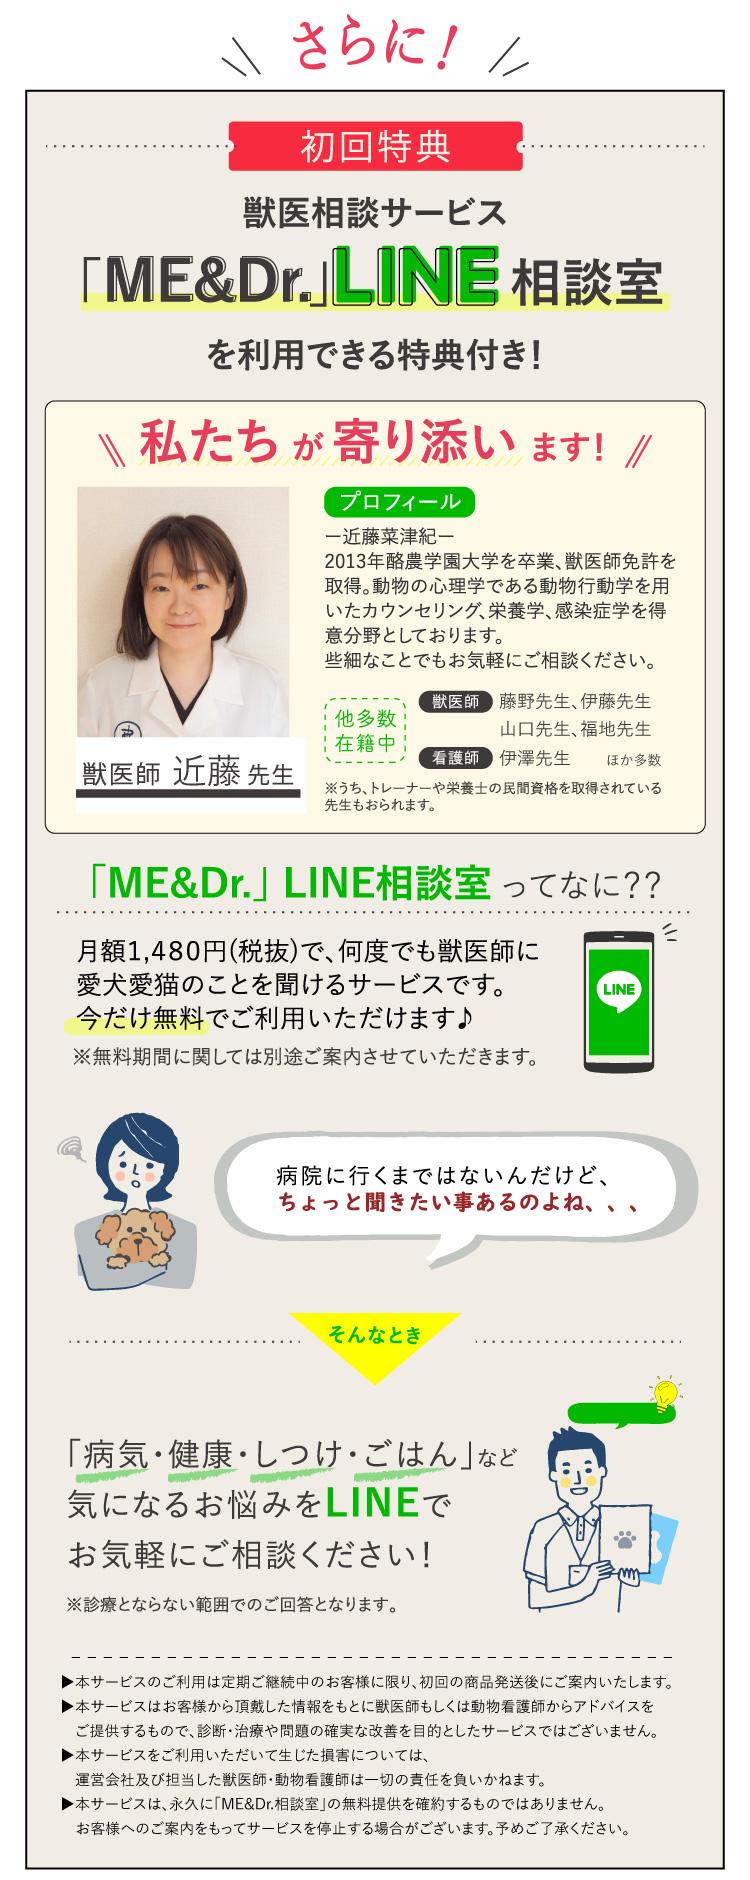 ME&Dr.LINE無料相談室